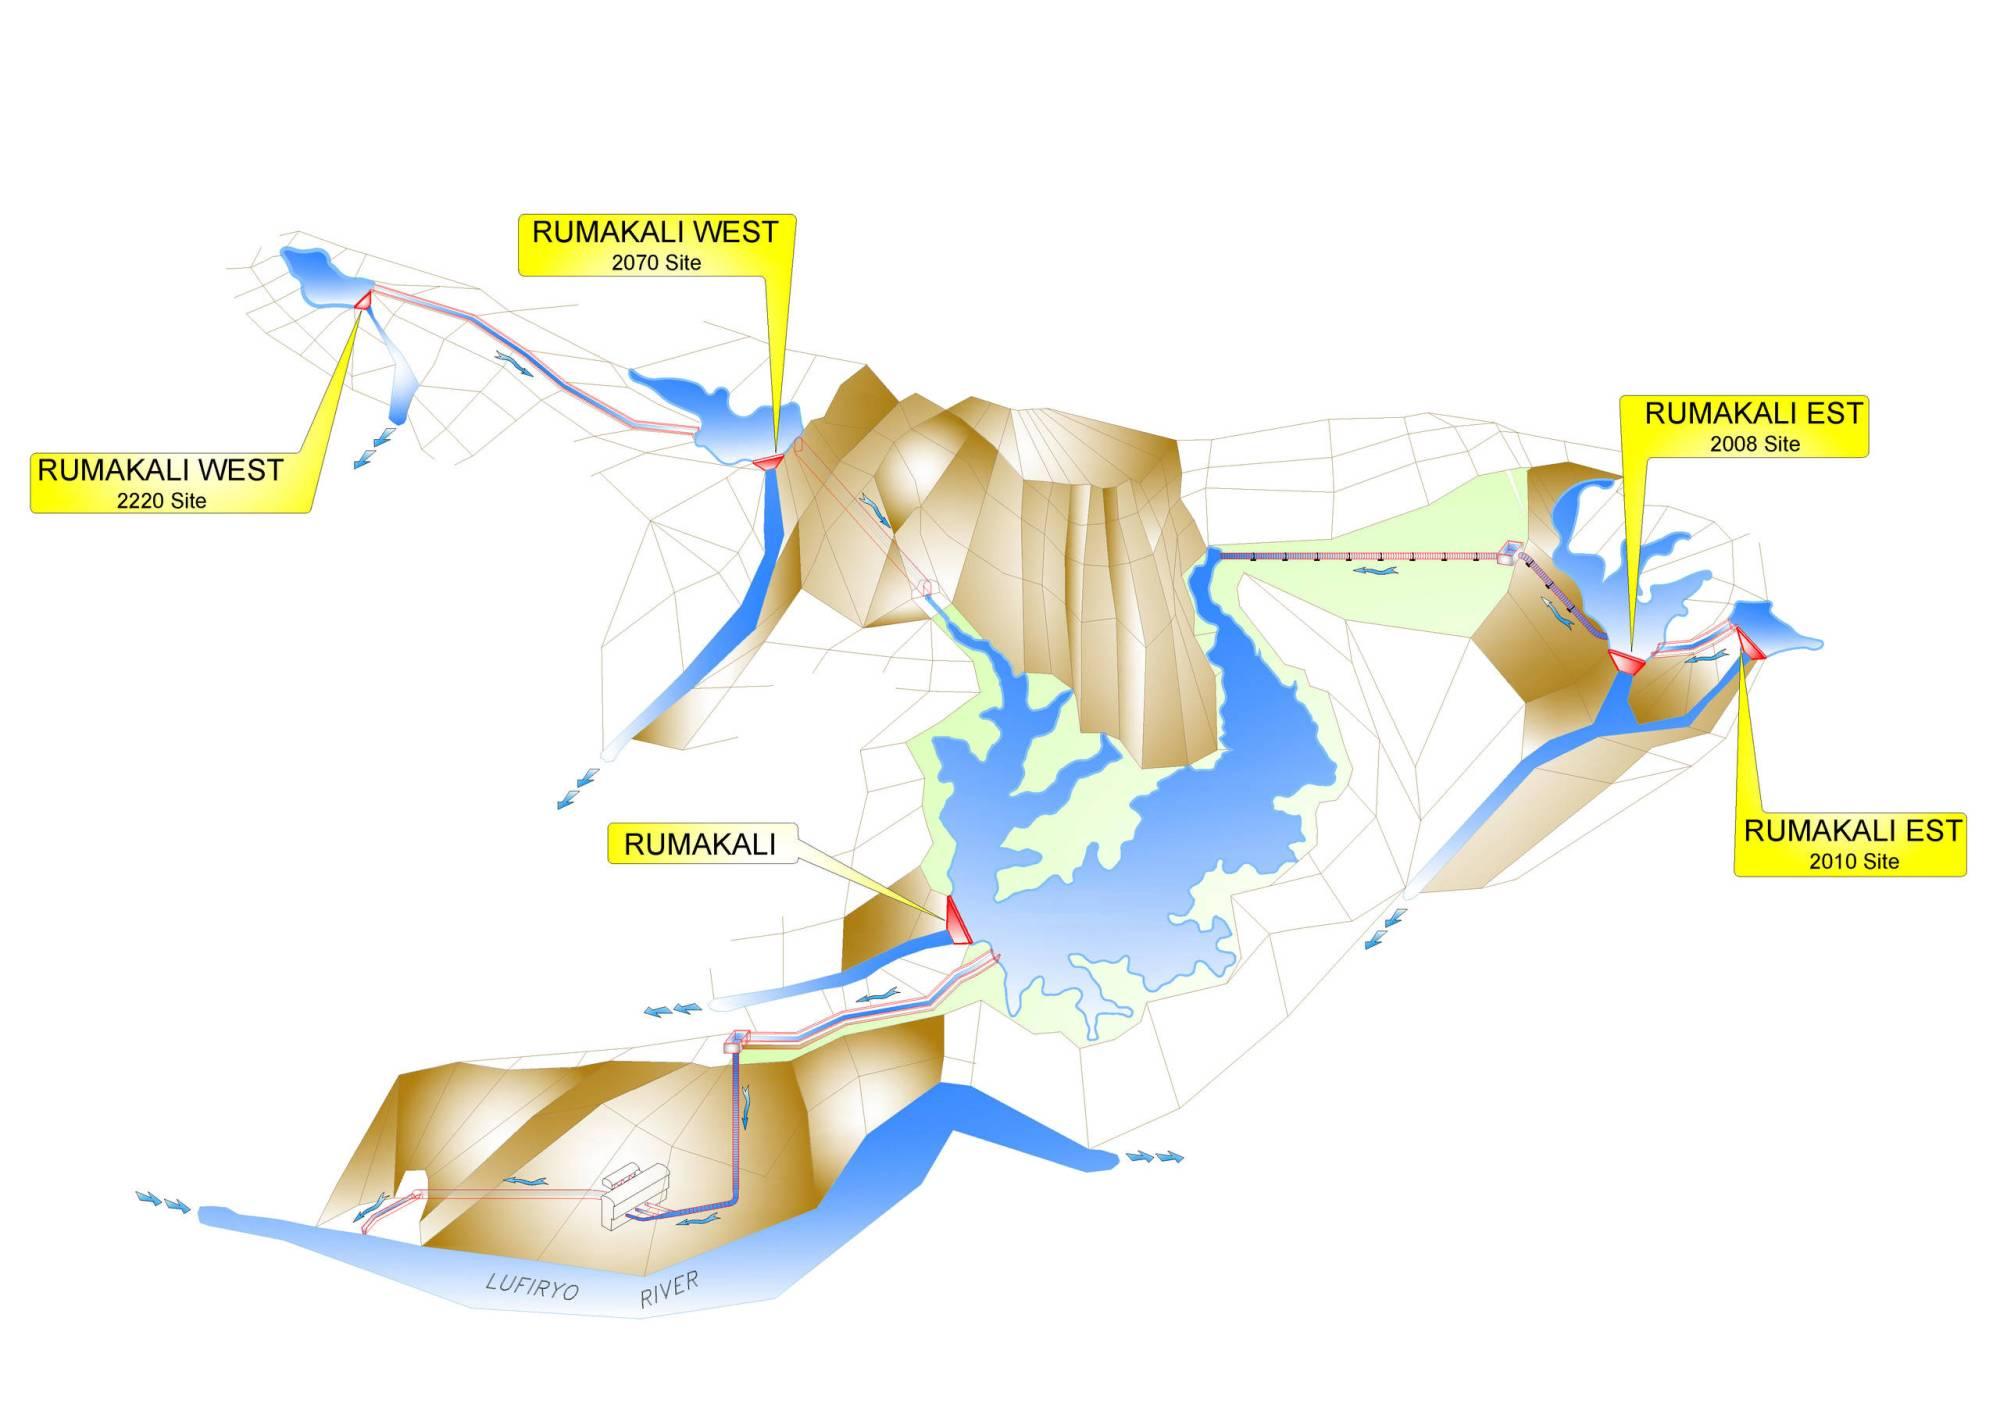 hight resolution of hydropower hydroelectric power plant hydro consultancy hydropower engineering rumakali iringa